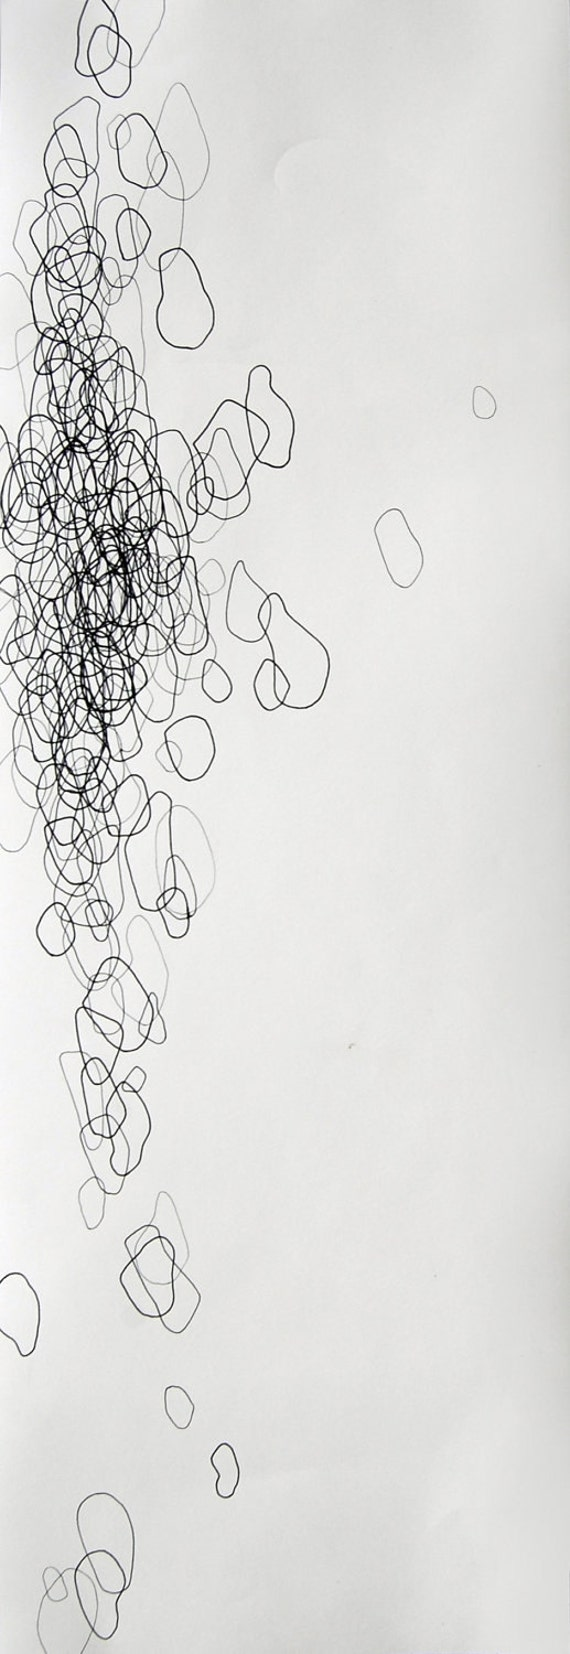 "Swim, tall 8"" x 24"" original abstract drawing"